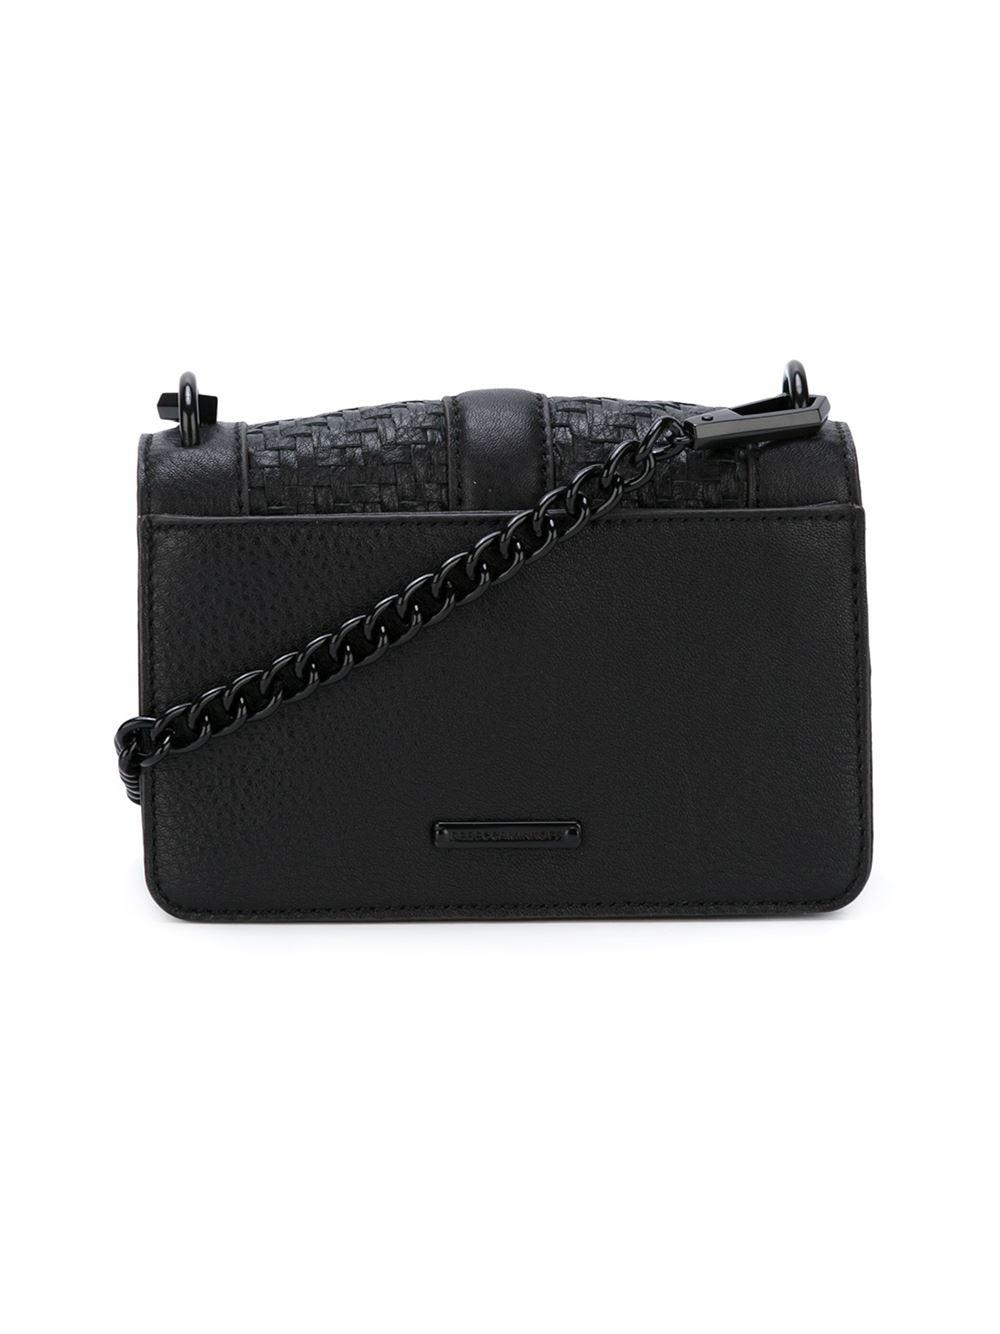 Rebecca Minkoff Leather Love Crossbody Bag in Black